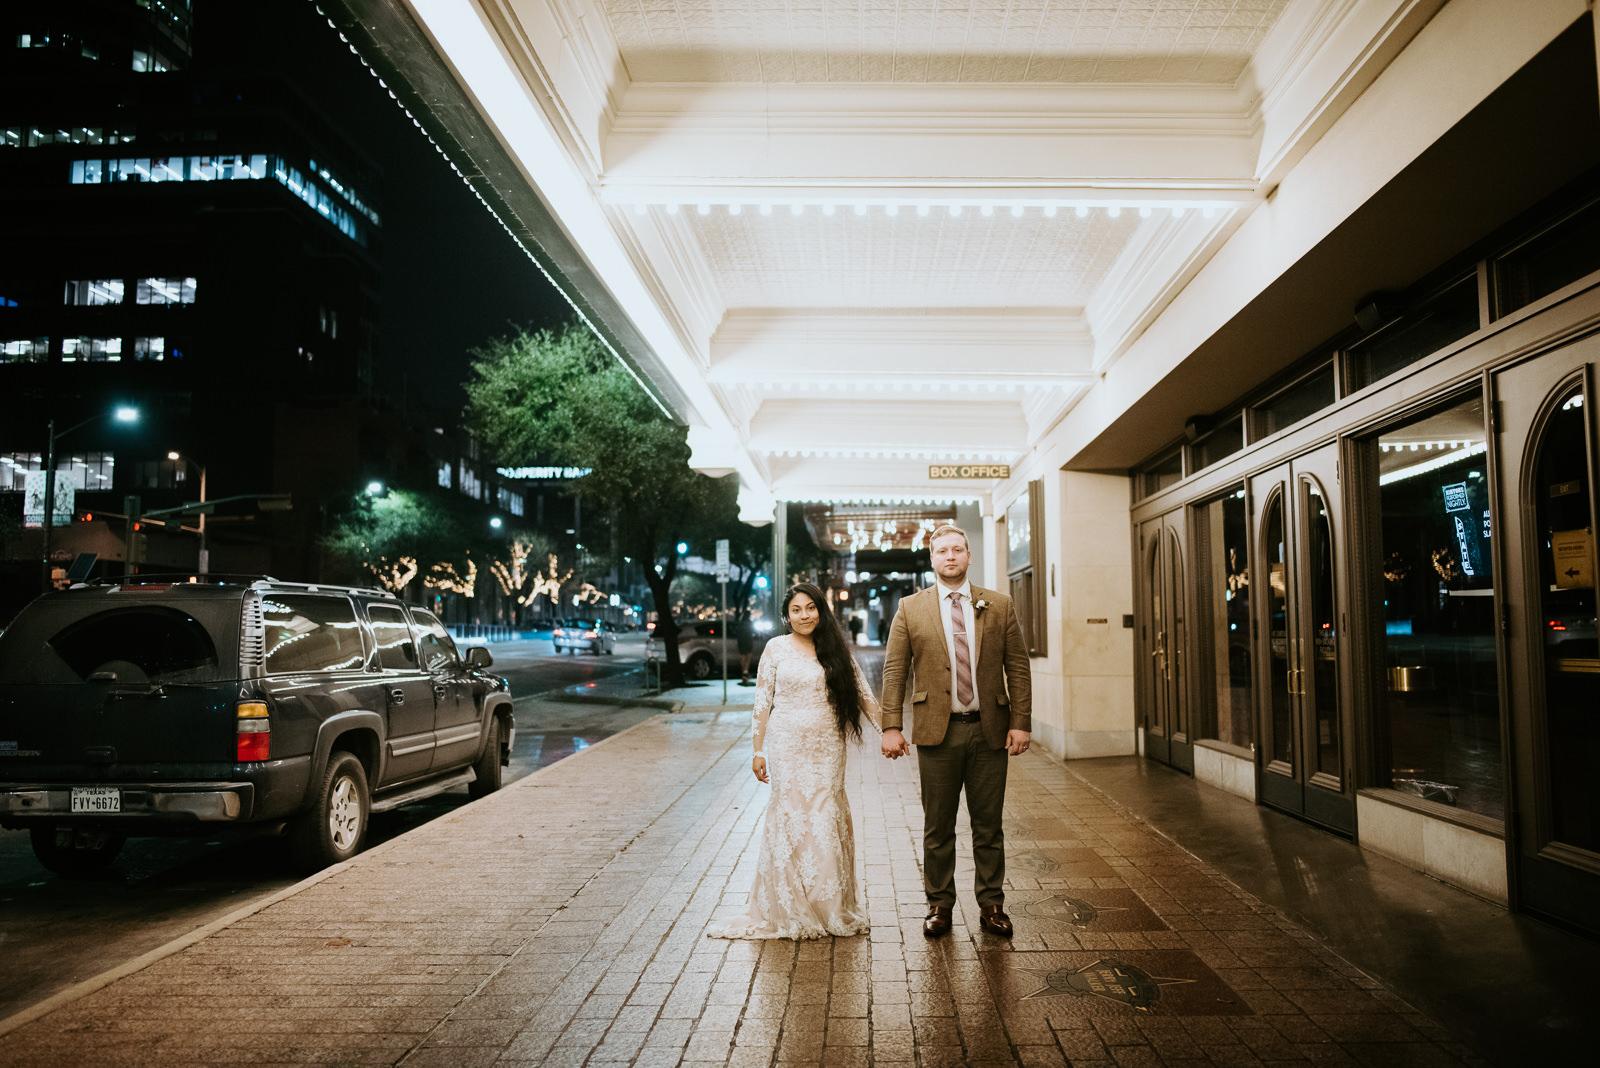 wedding portraits in downtown austin texas